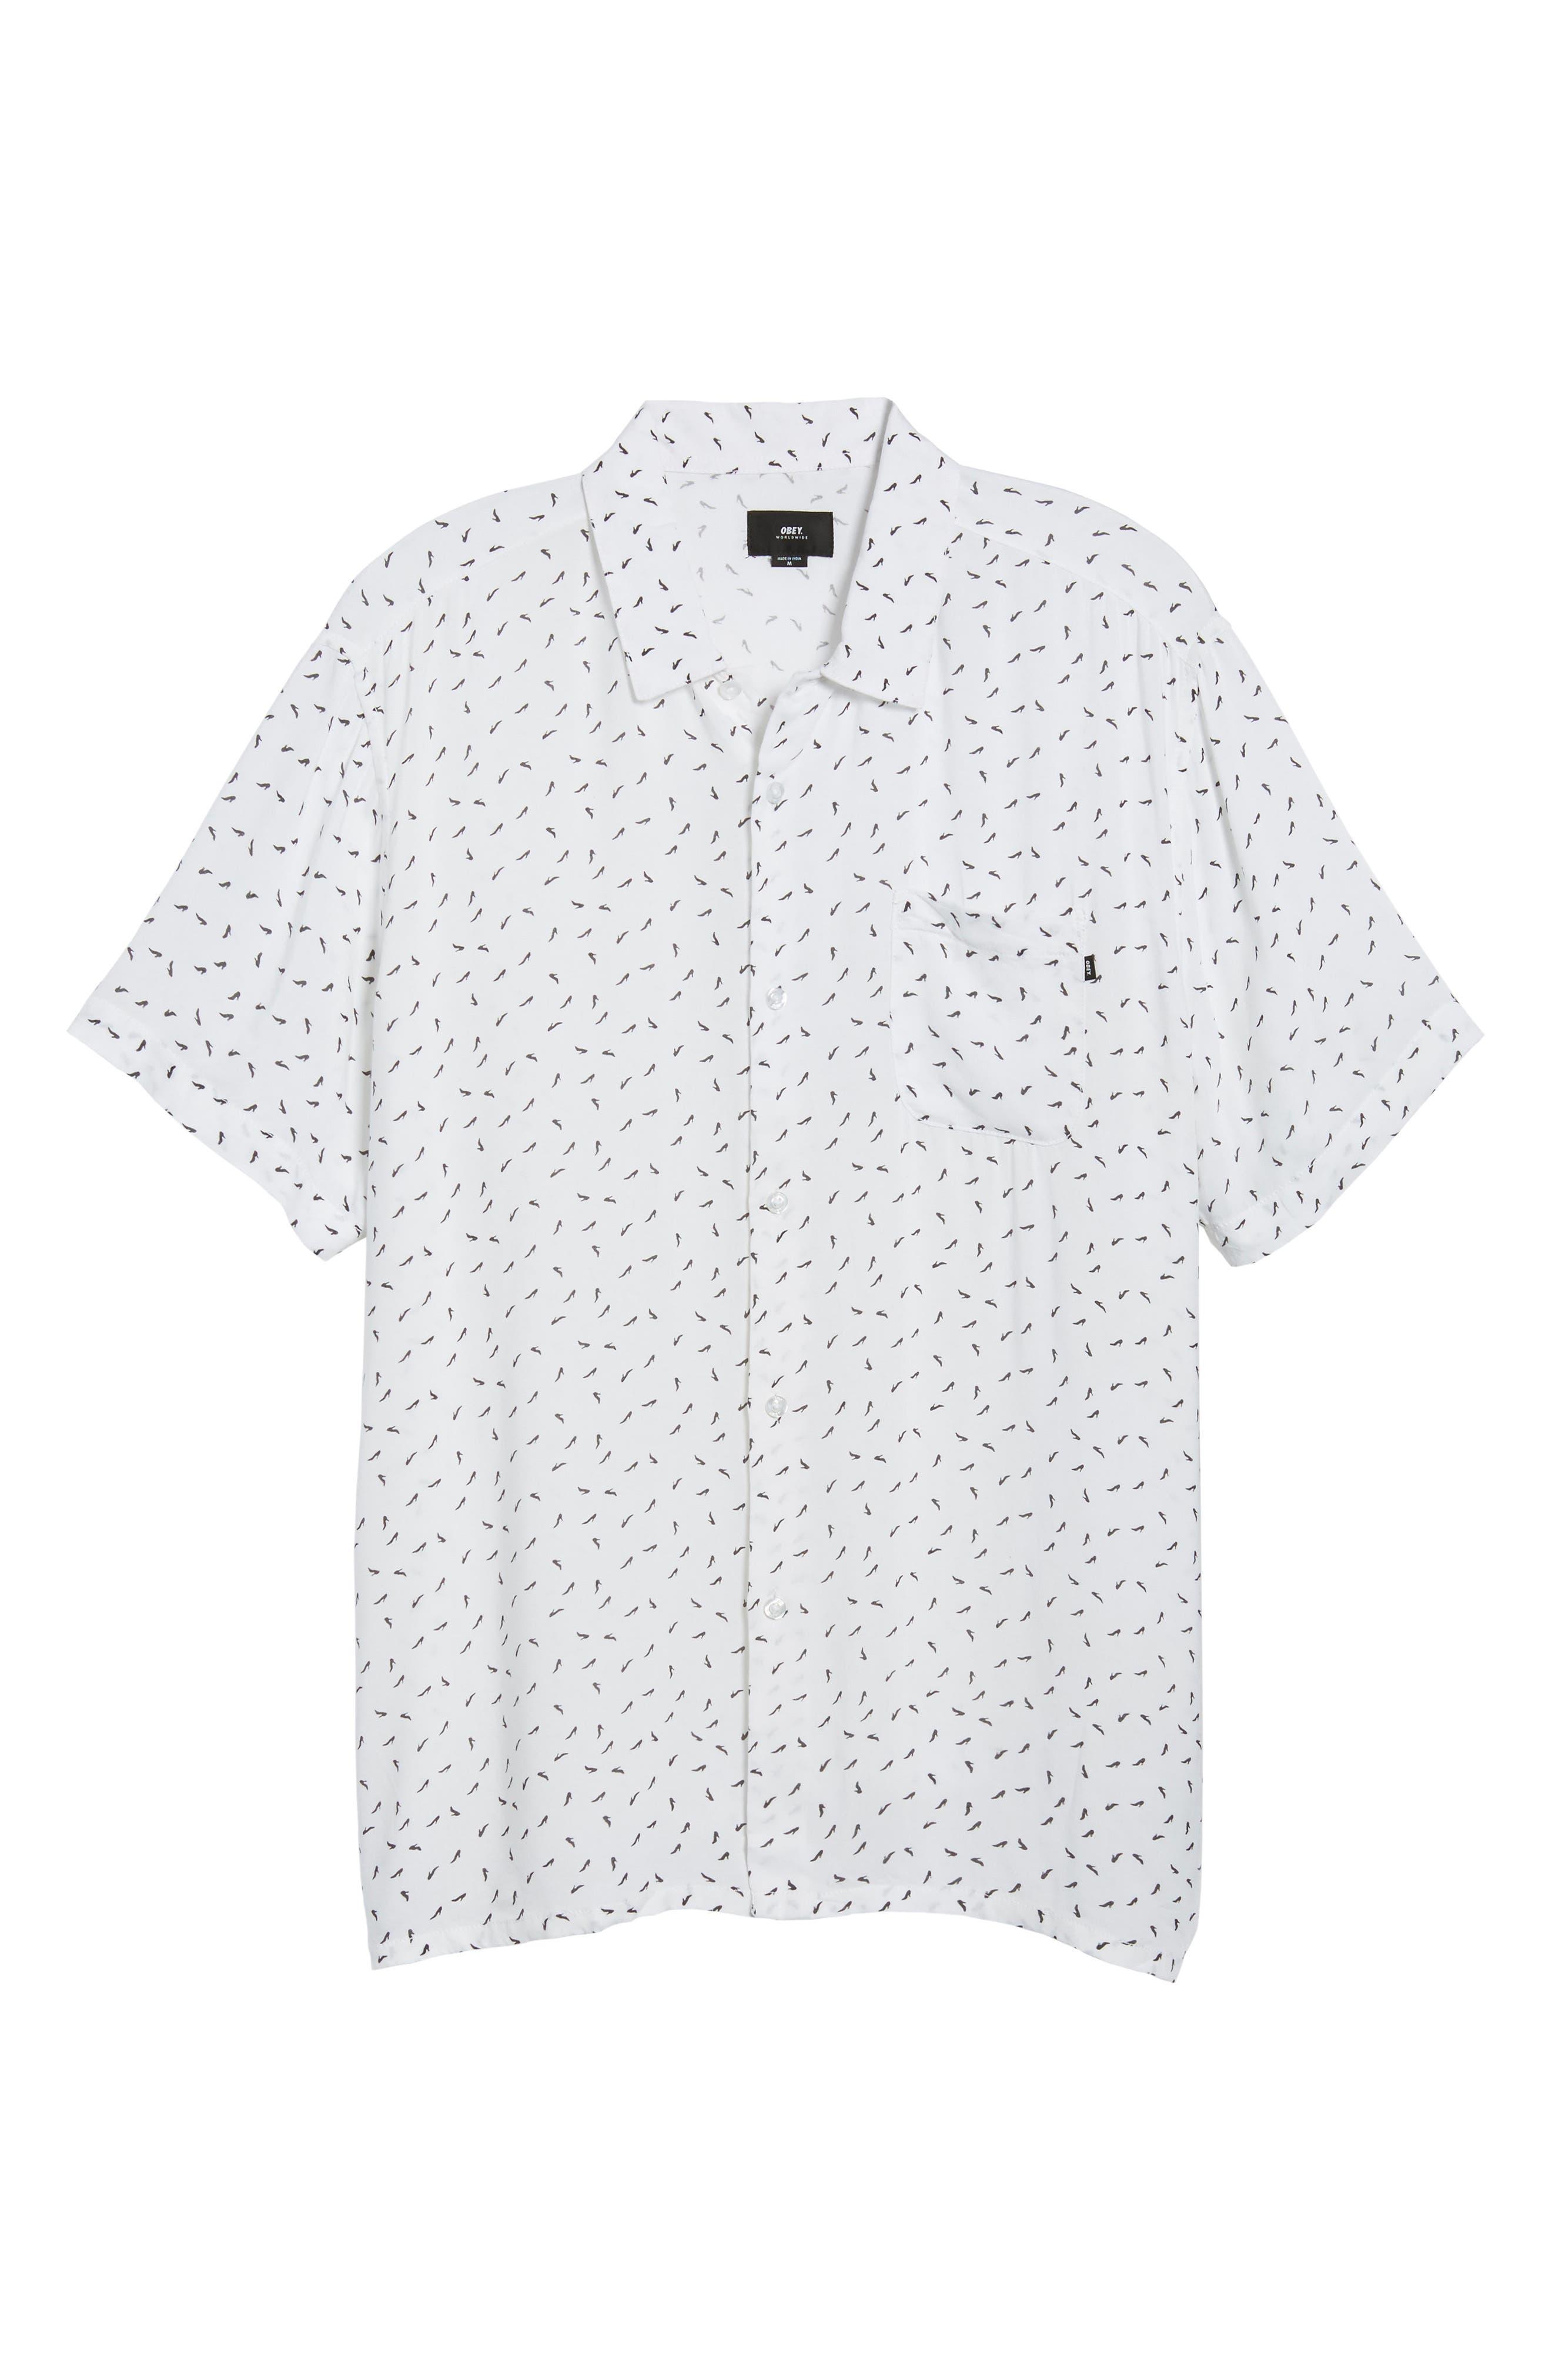 Pumps Short Sleeve Shirt,                             Alternate thumbnail 6, color,                             White Multi